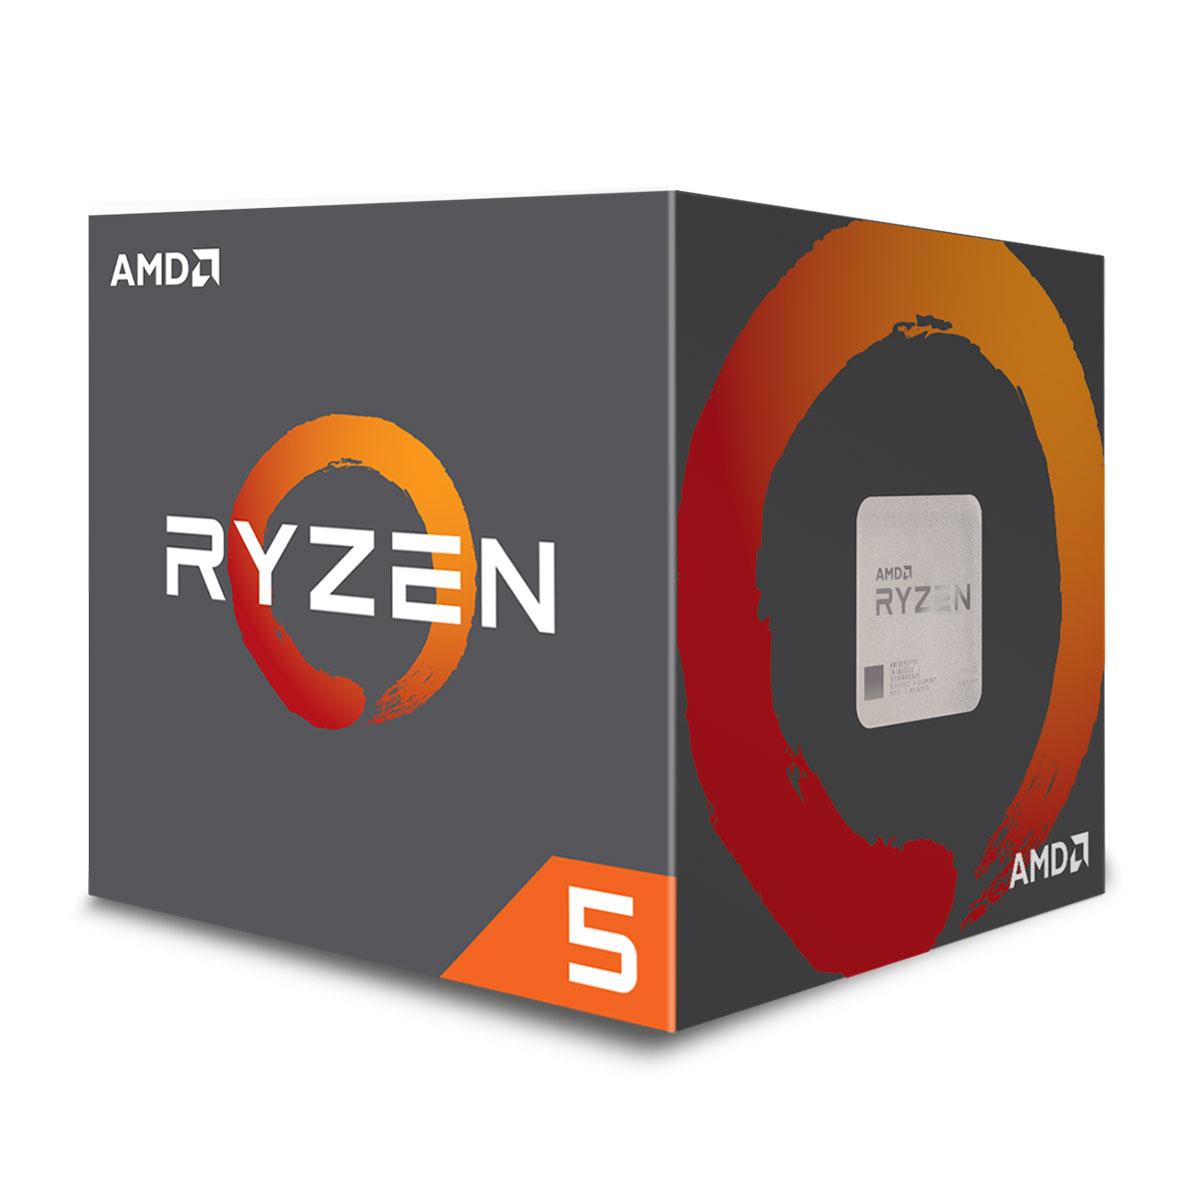 Processeur AMD Ryzen 5 1500X (3.5 GHz)